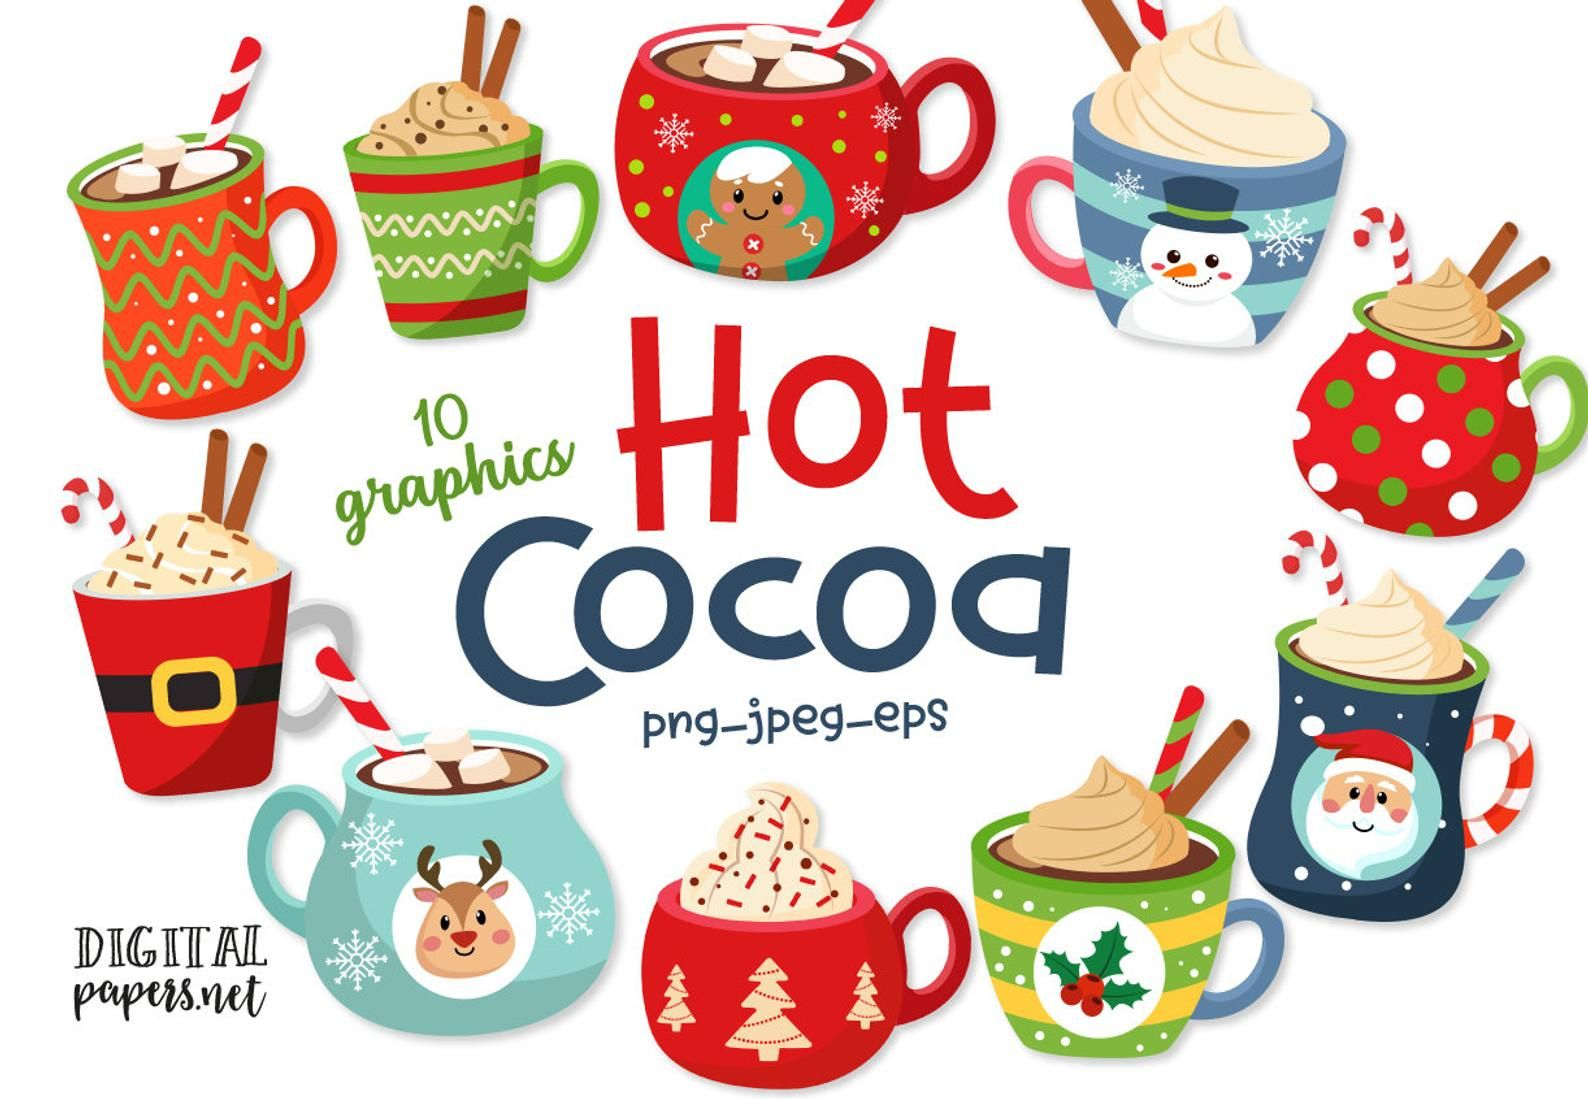 Hot Chocolate Mug Christmas Clipart Hot Cocoa Winter Clip Etsy Hot Cocoa Hot Chocolate Mug Christmas Clipart